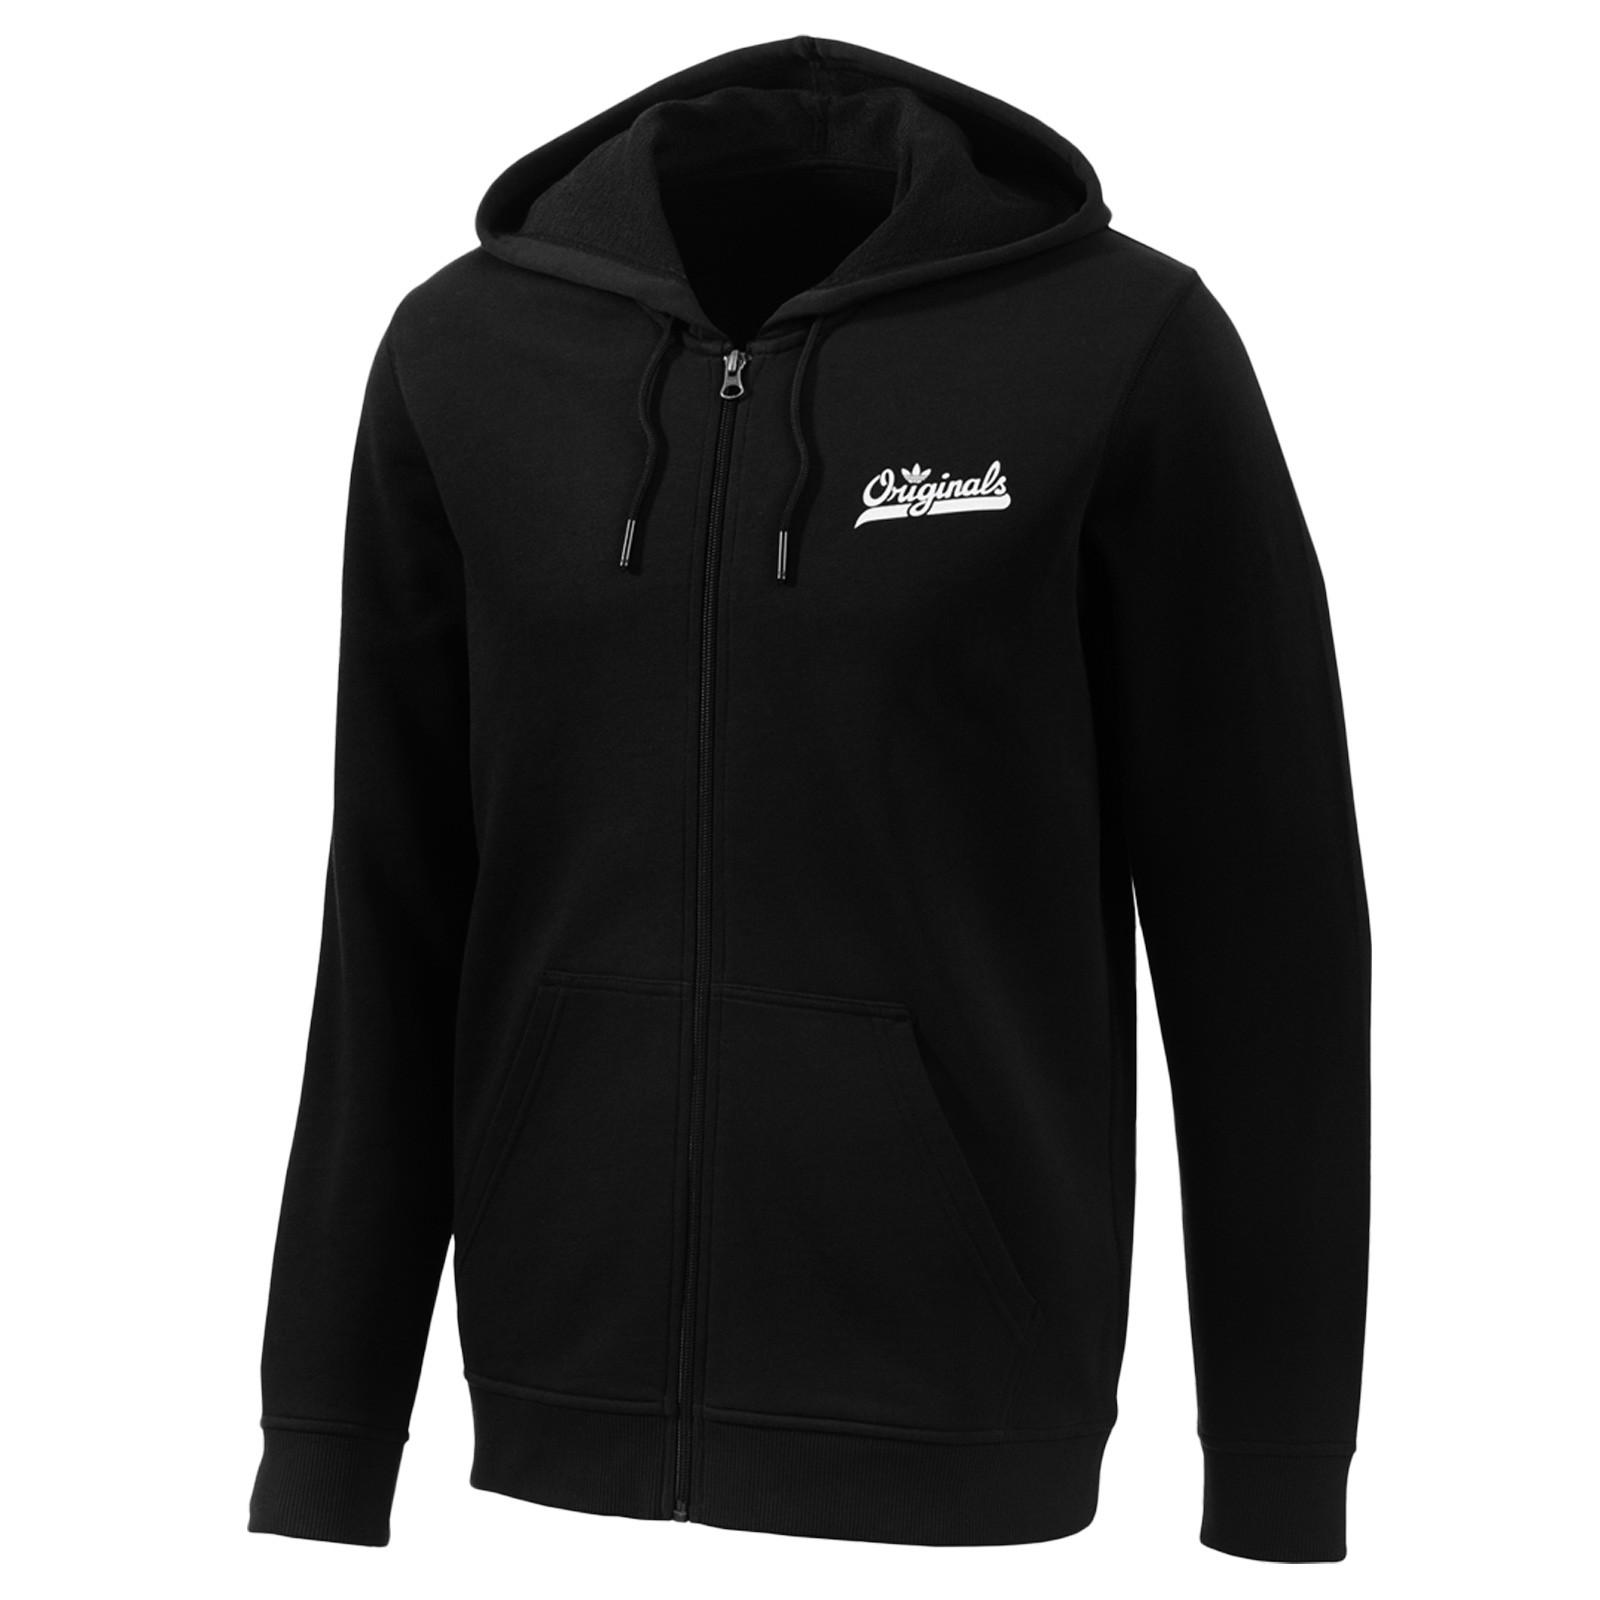 adidas originals graphic crew trefoil jacke sweatshirt hoodie pullover schwarz jungs trainingsjacken. Black Bedroom Furniture Sets. Home Design Ideas